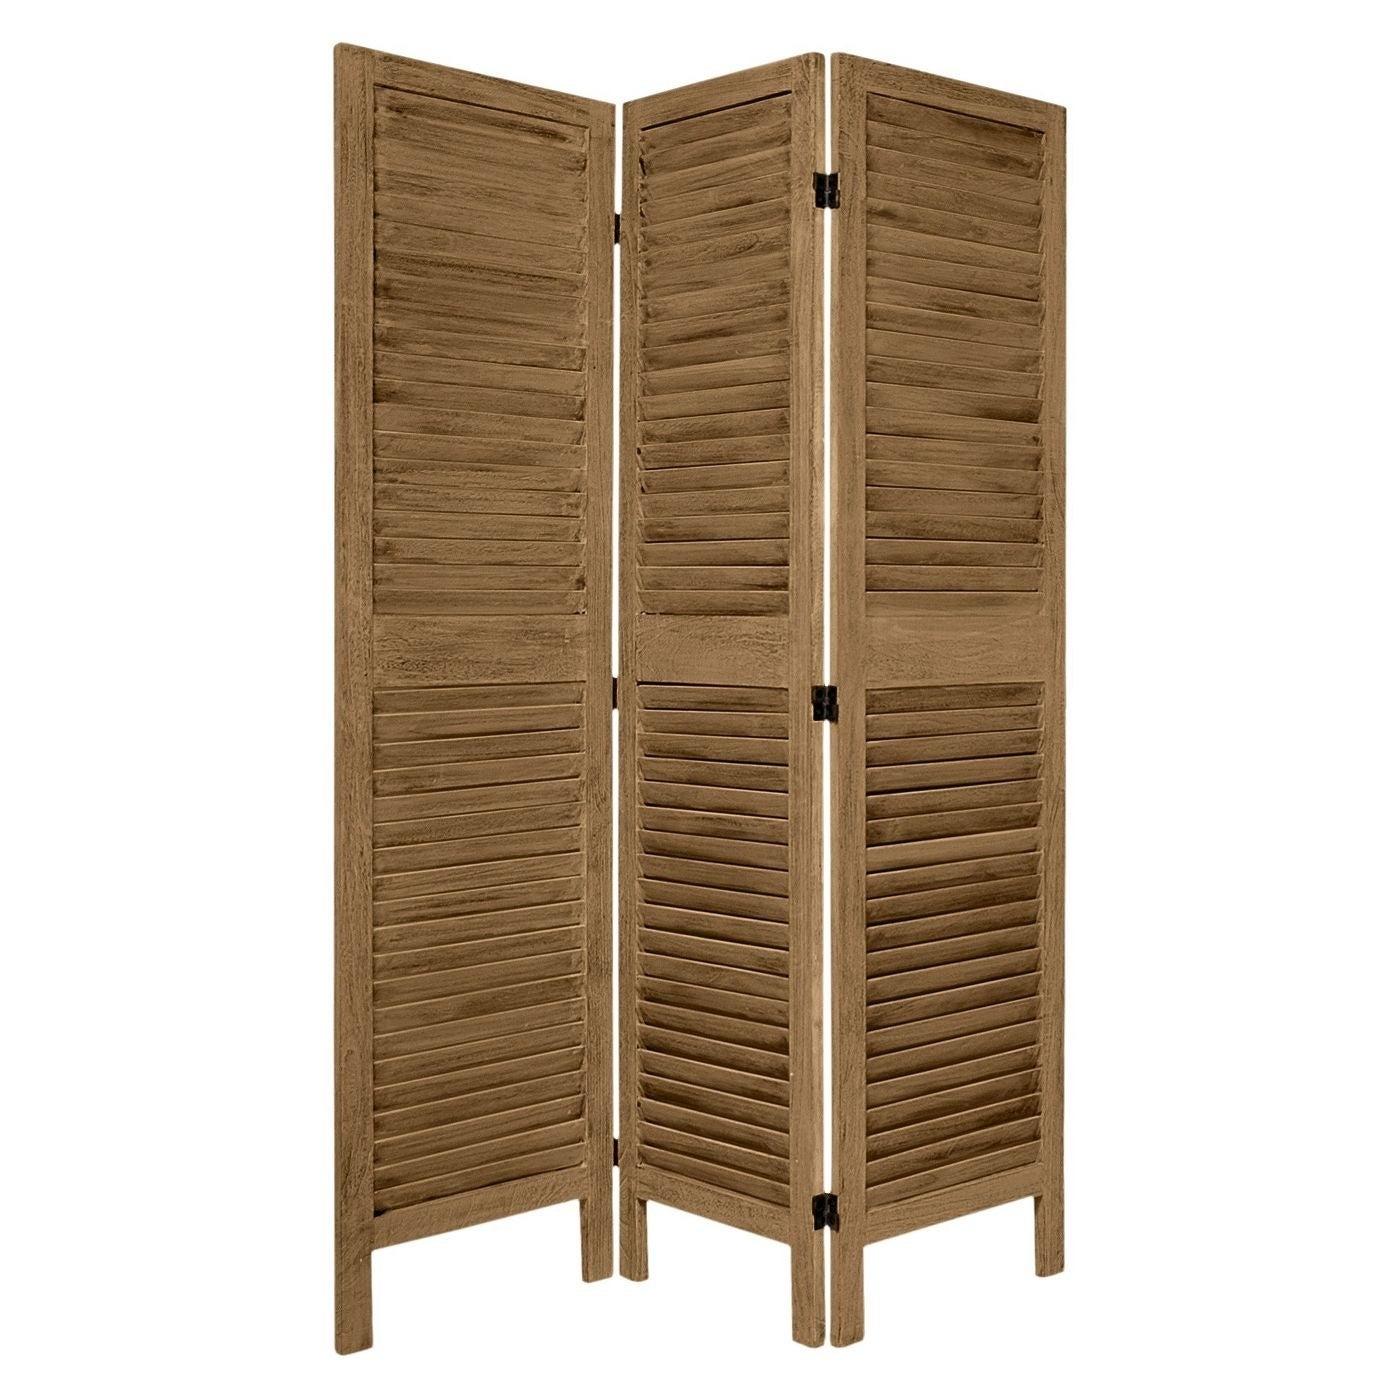 a three-paneled room divider